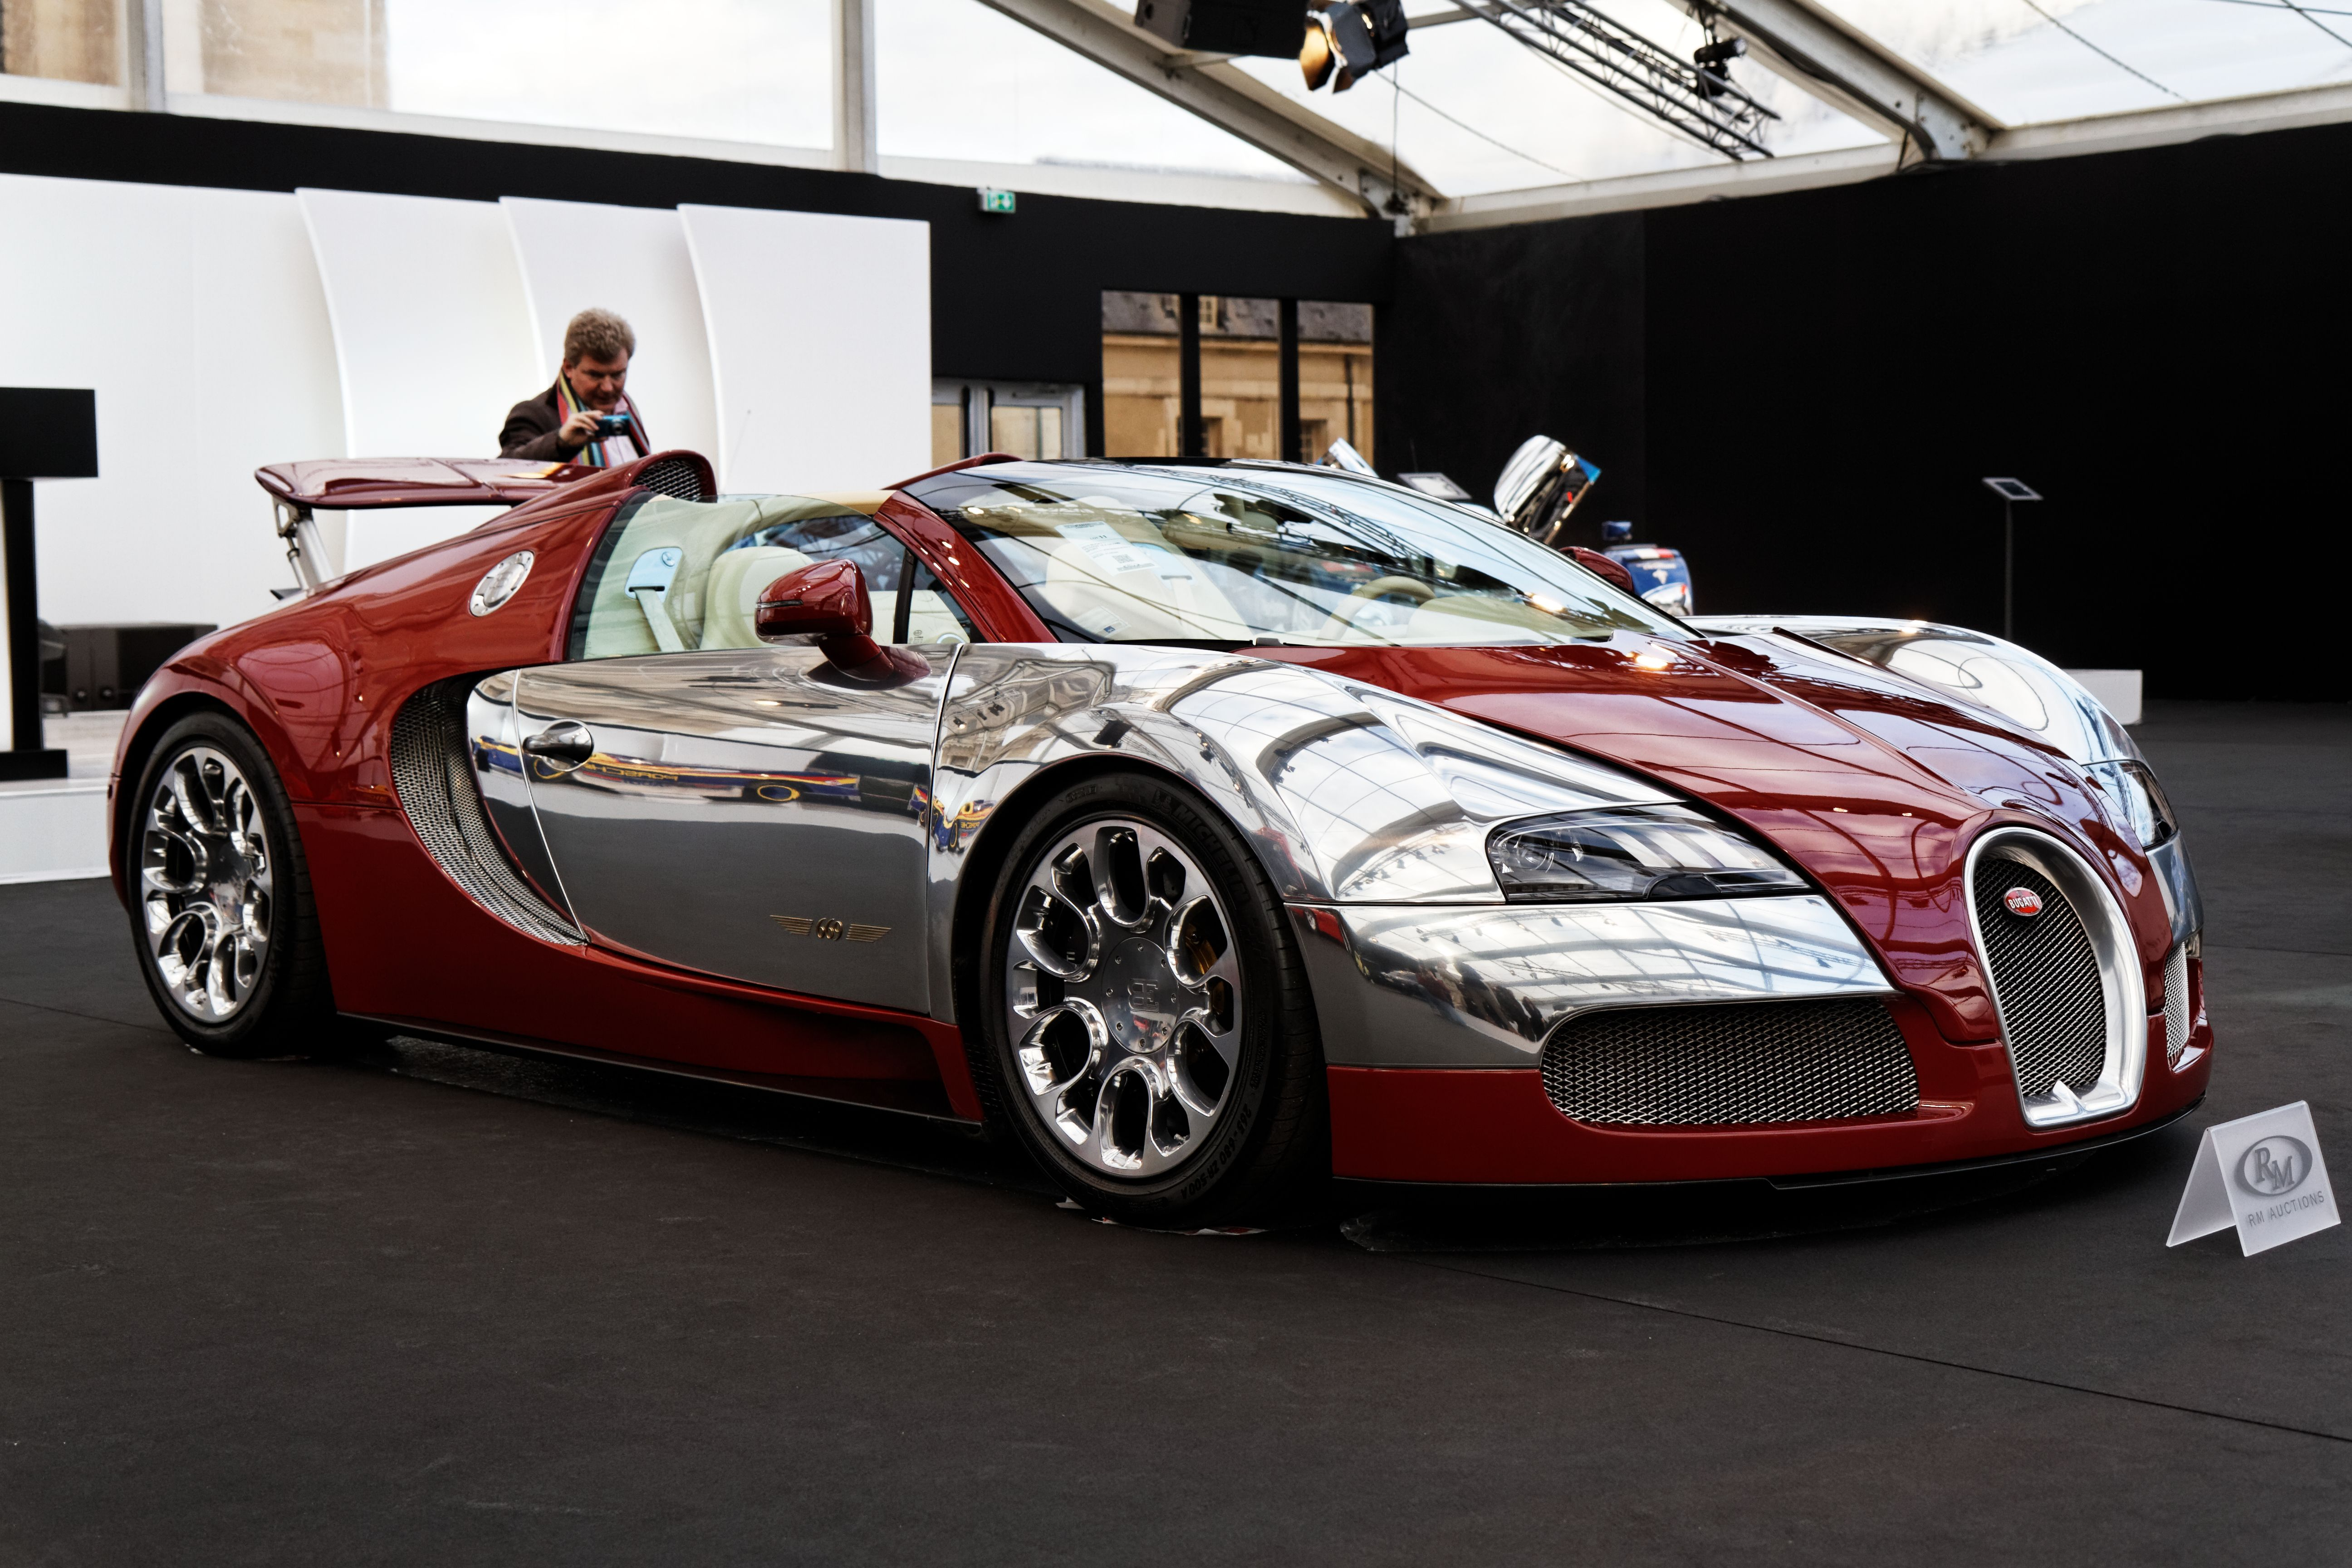 Merveilleux Bugatti Veyron 16.4 Grand Sport